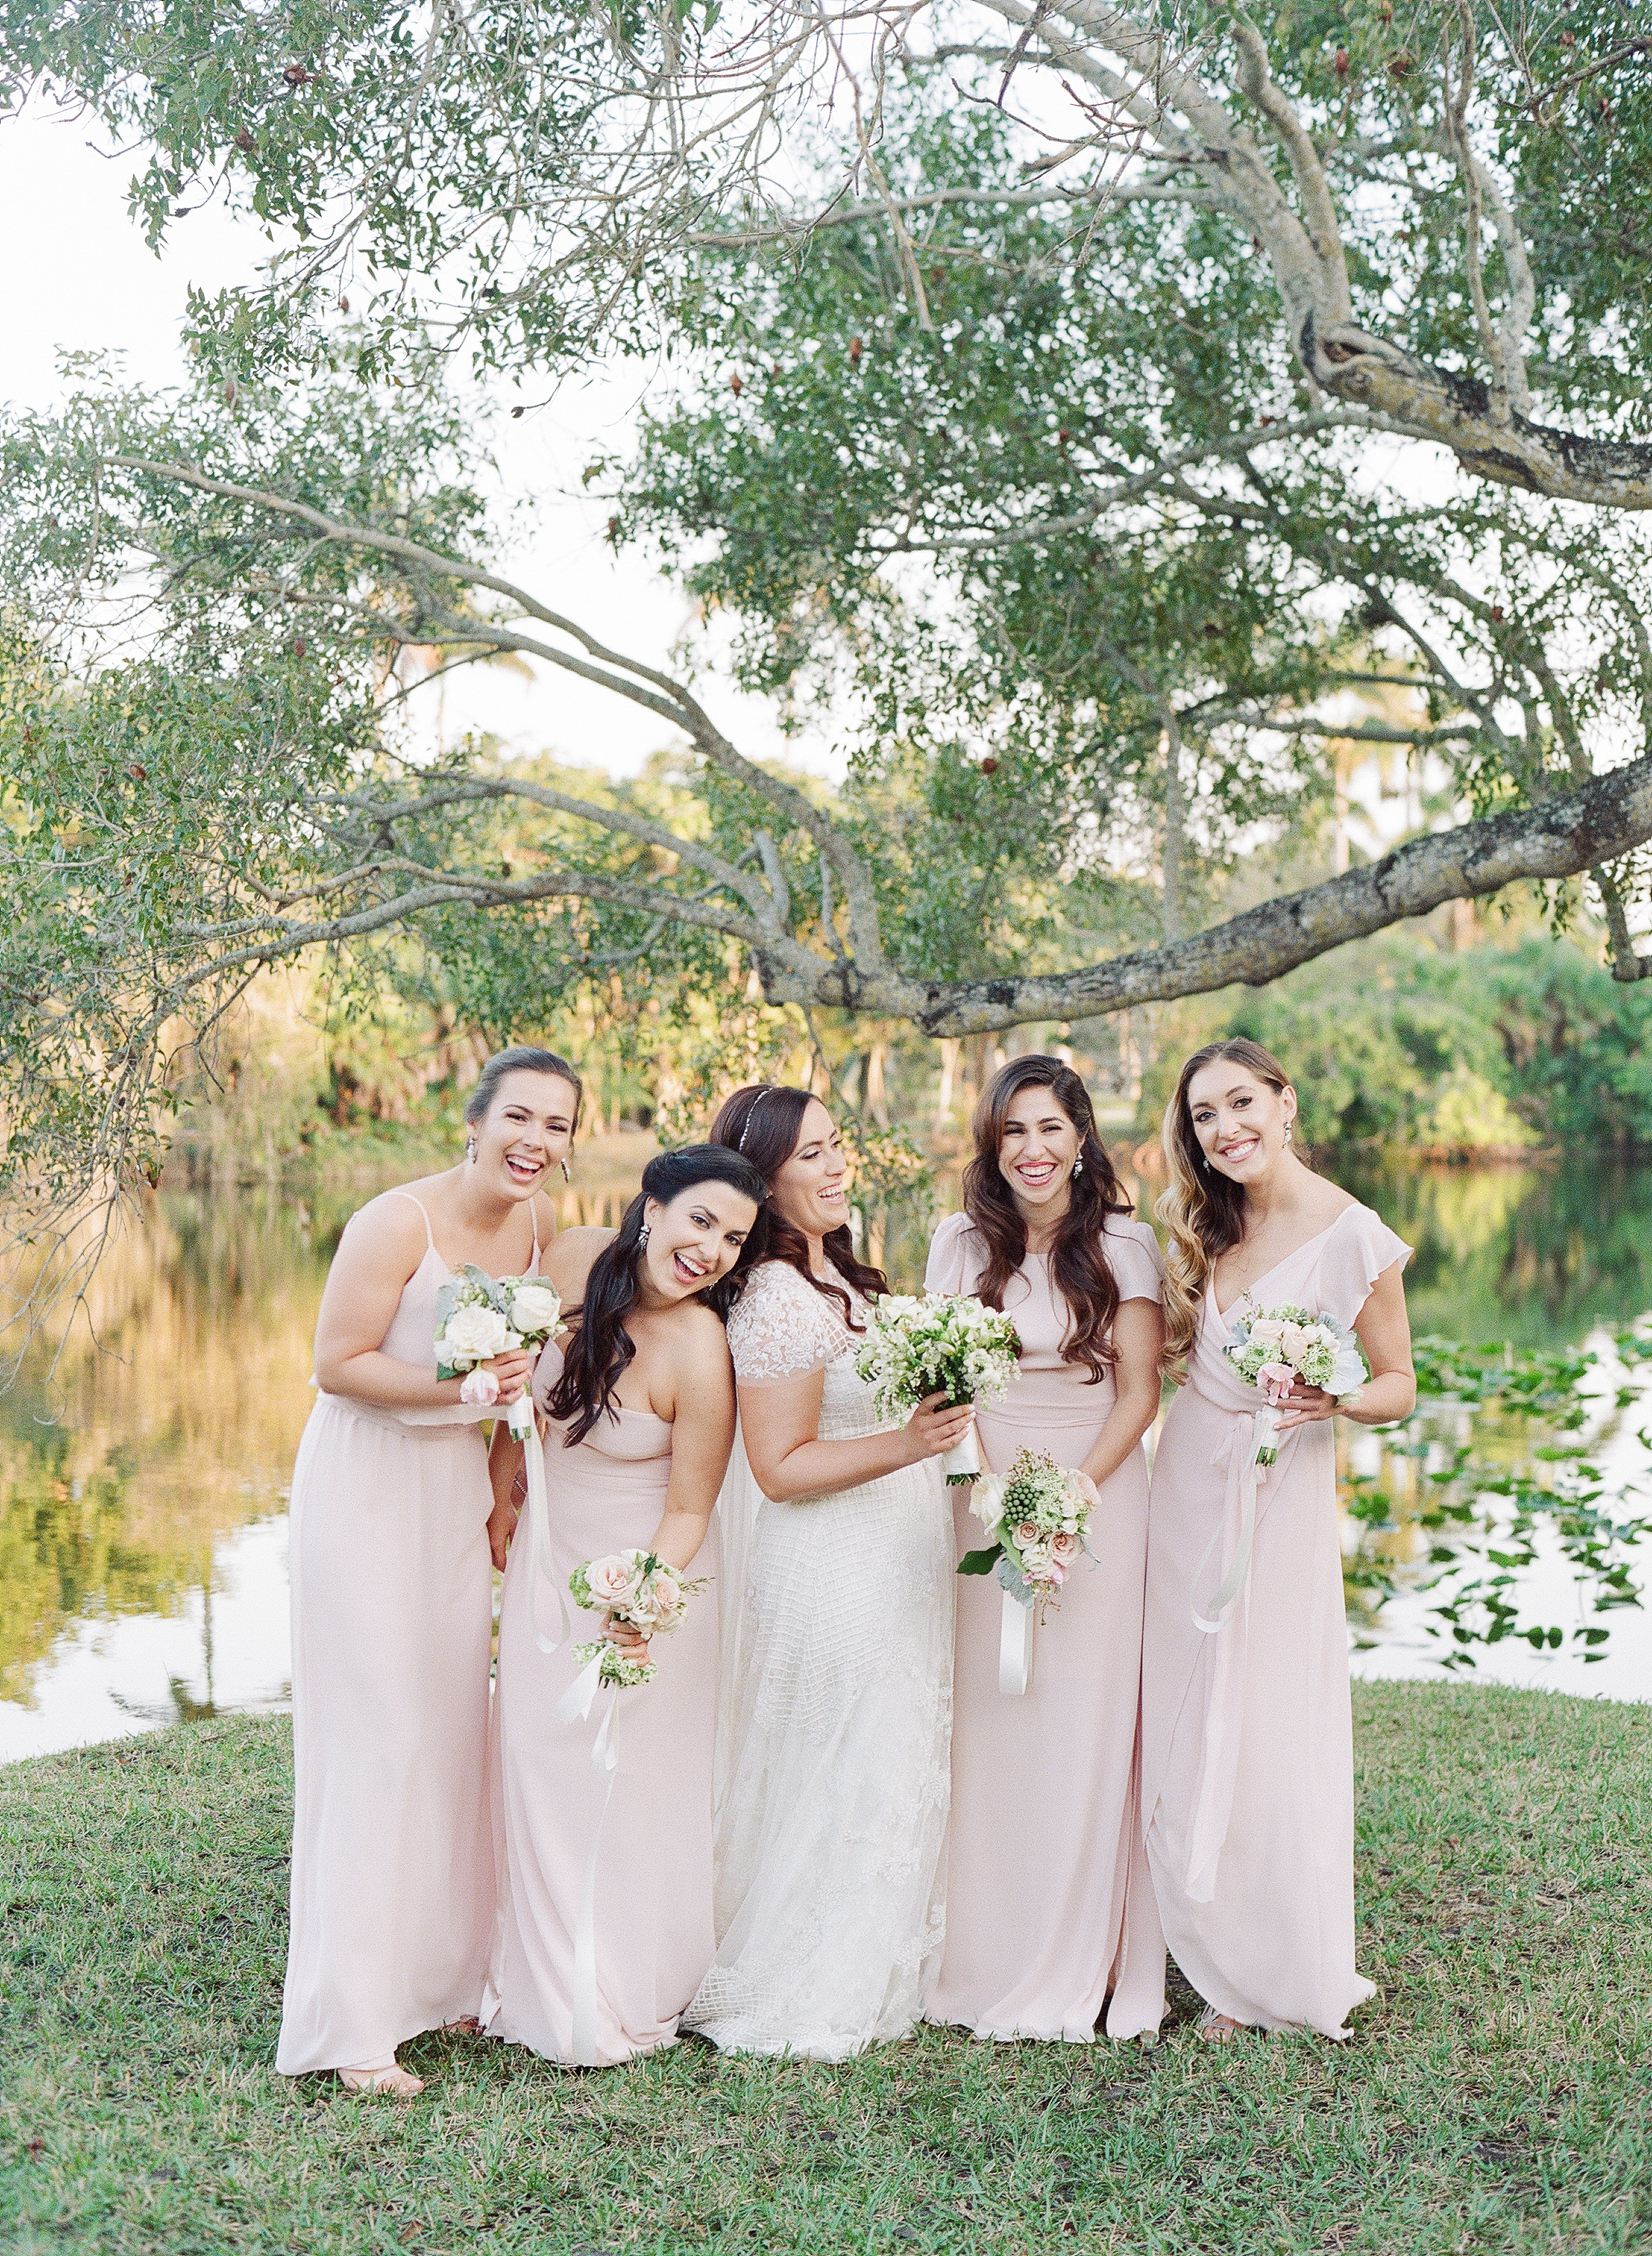 Mismatching blush bridesmaid dresses